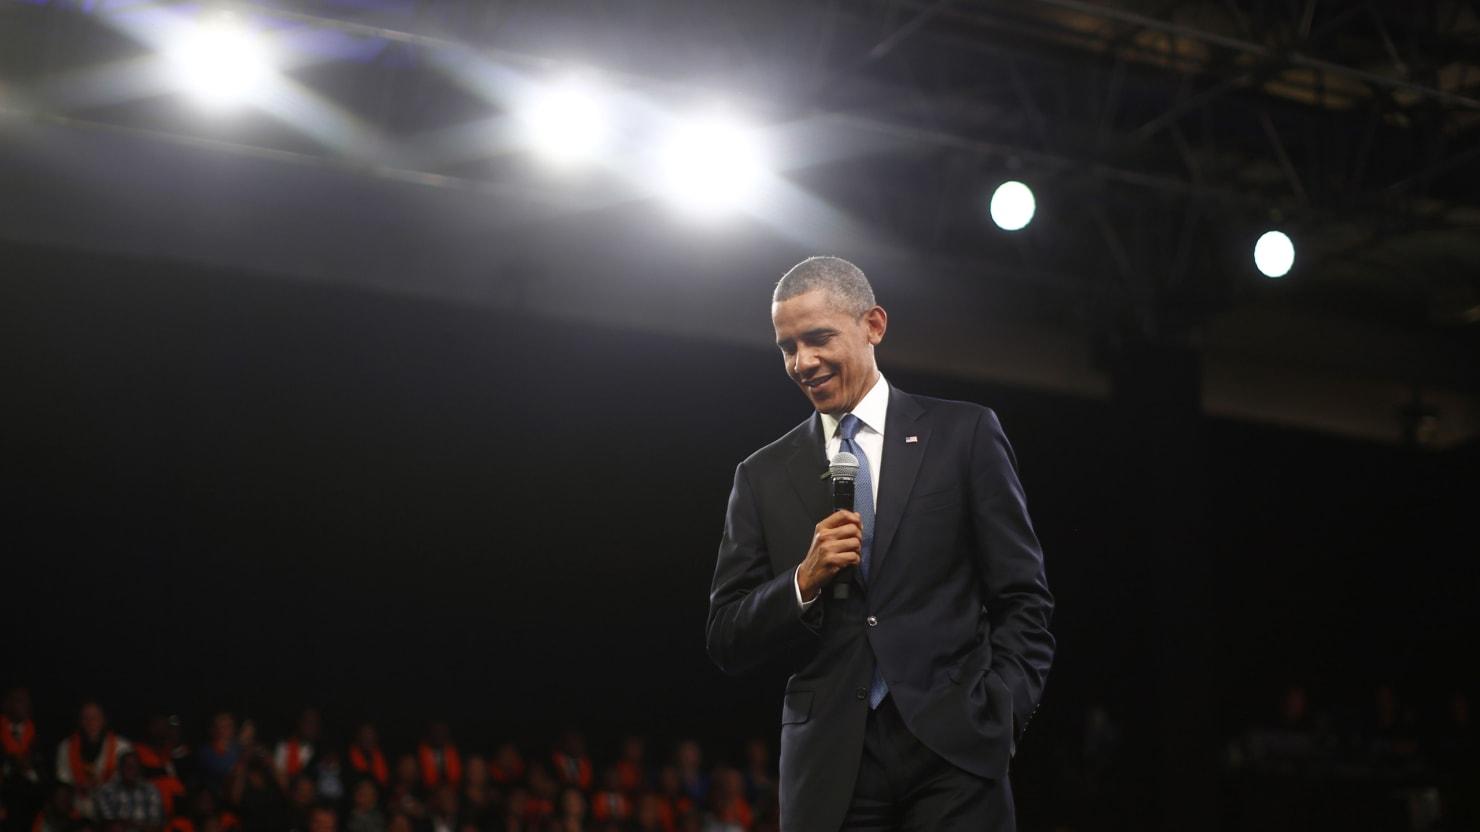 Obama's Shift Toward Communitarianism